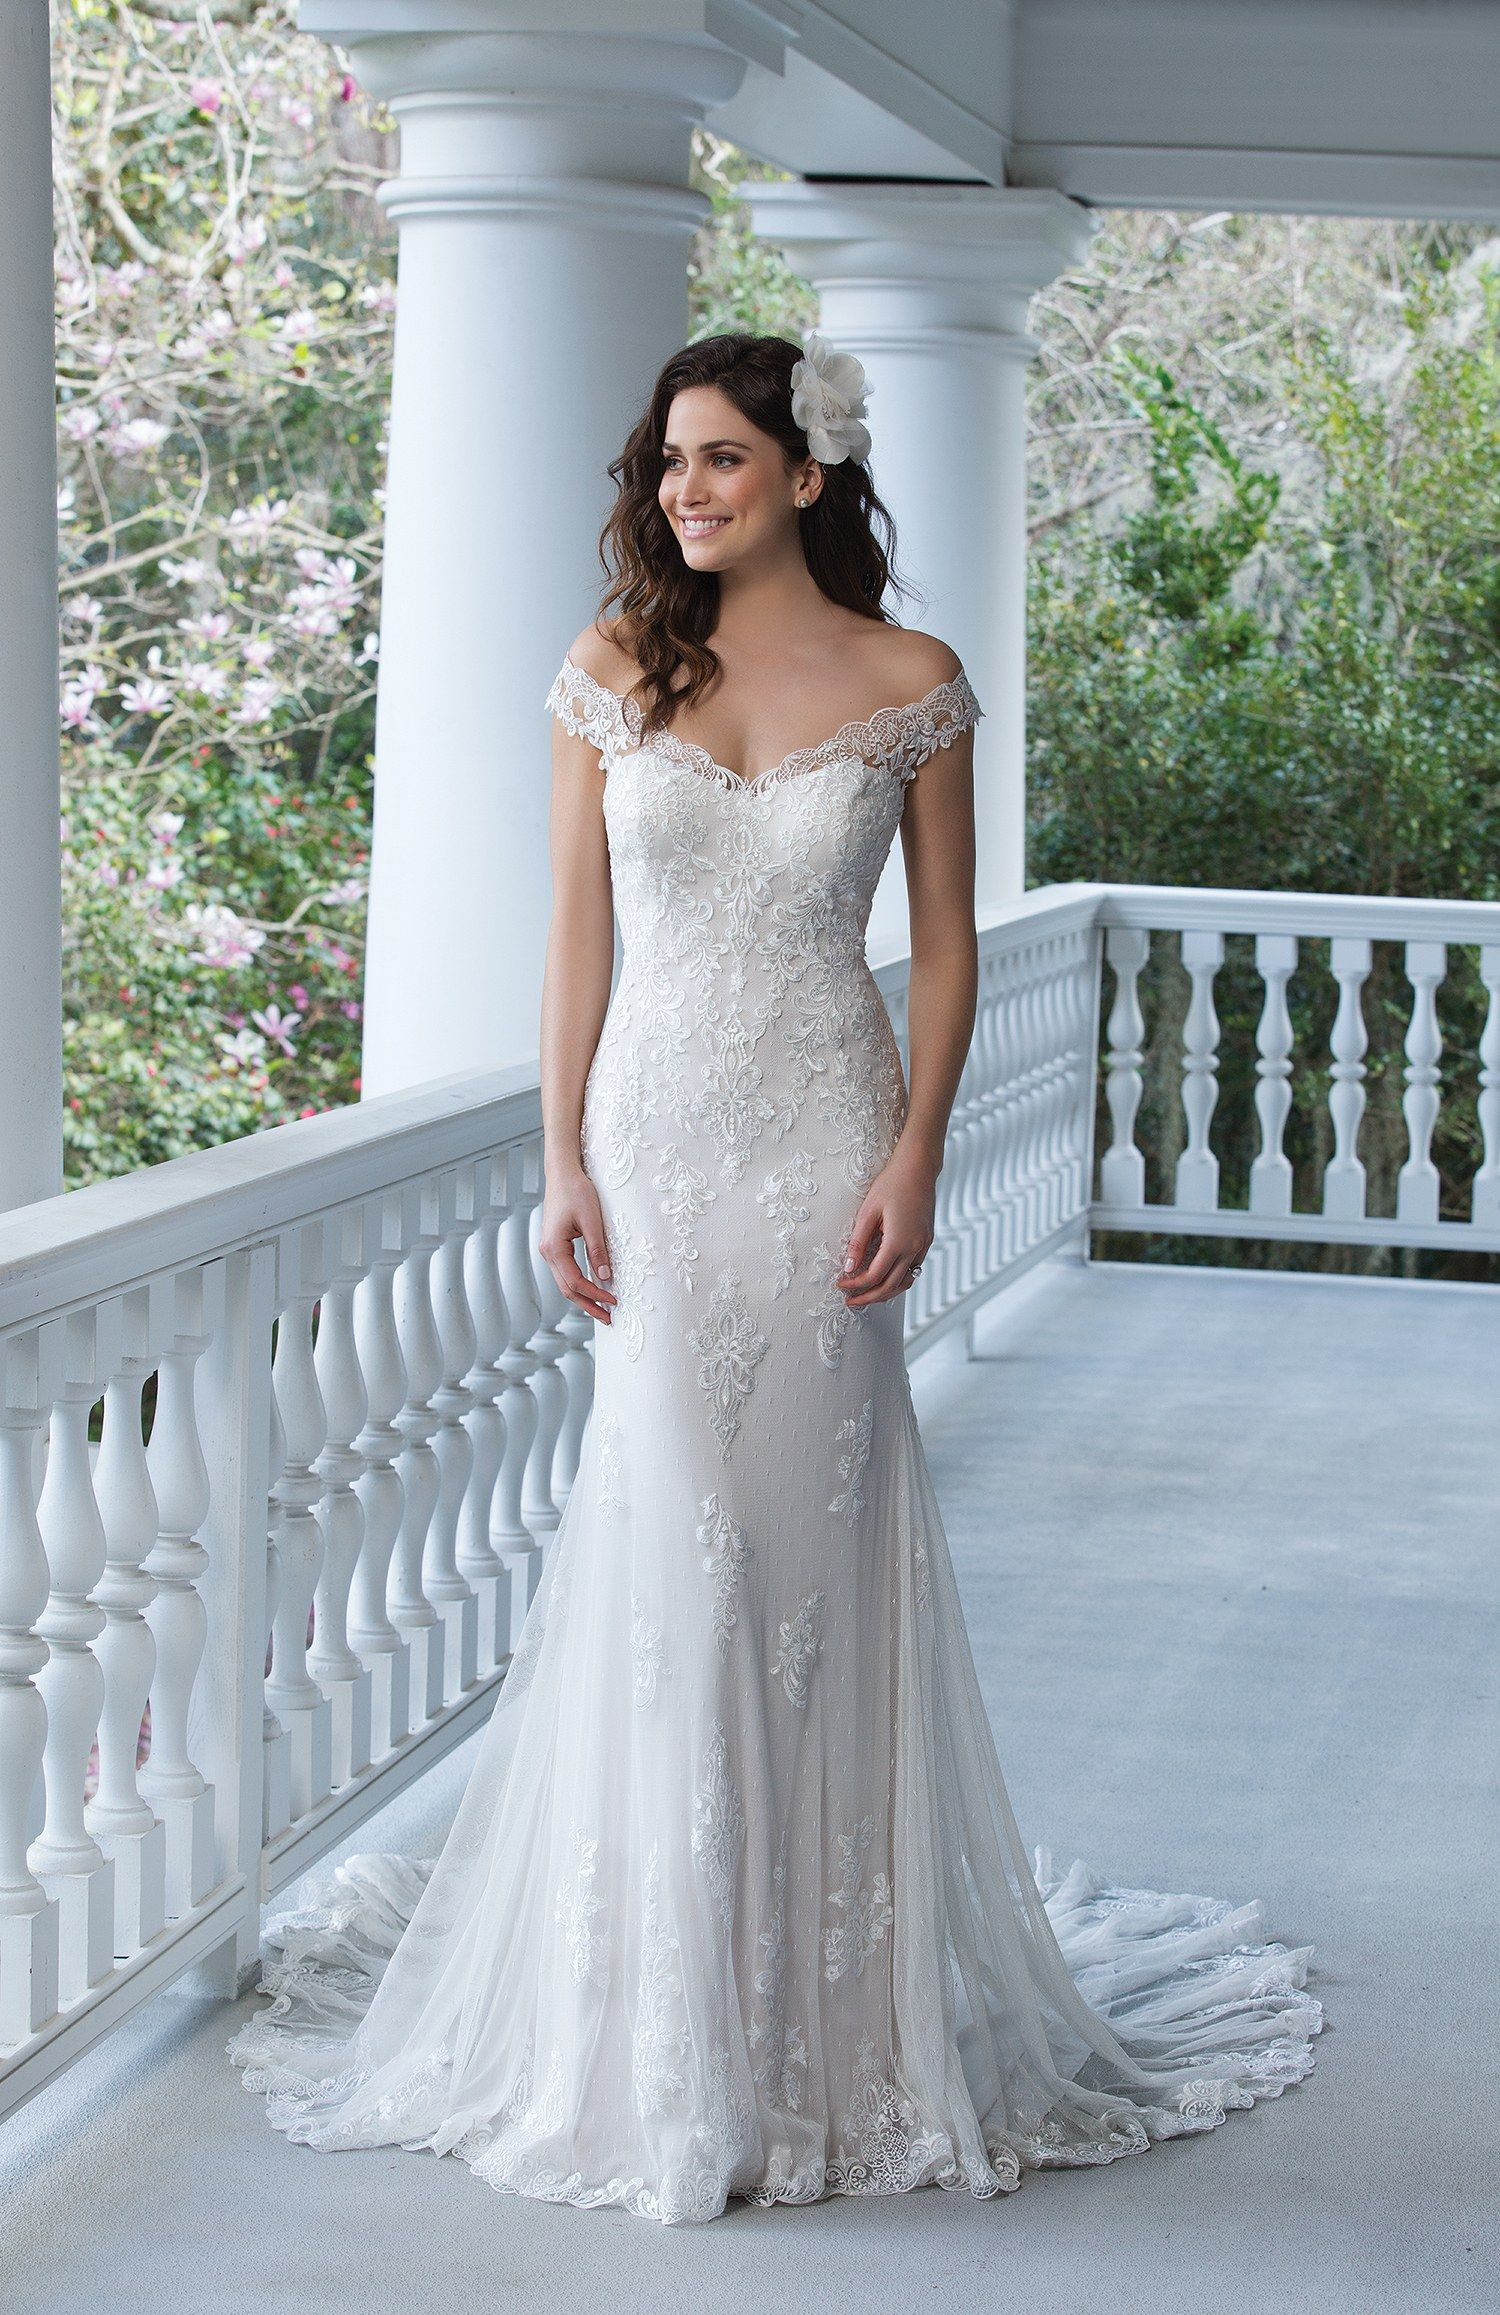 Wedding Dresses Under $1000